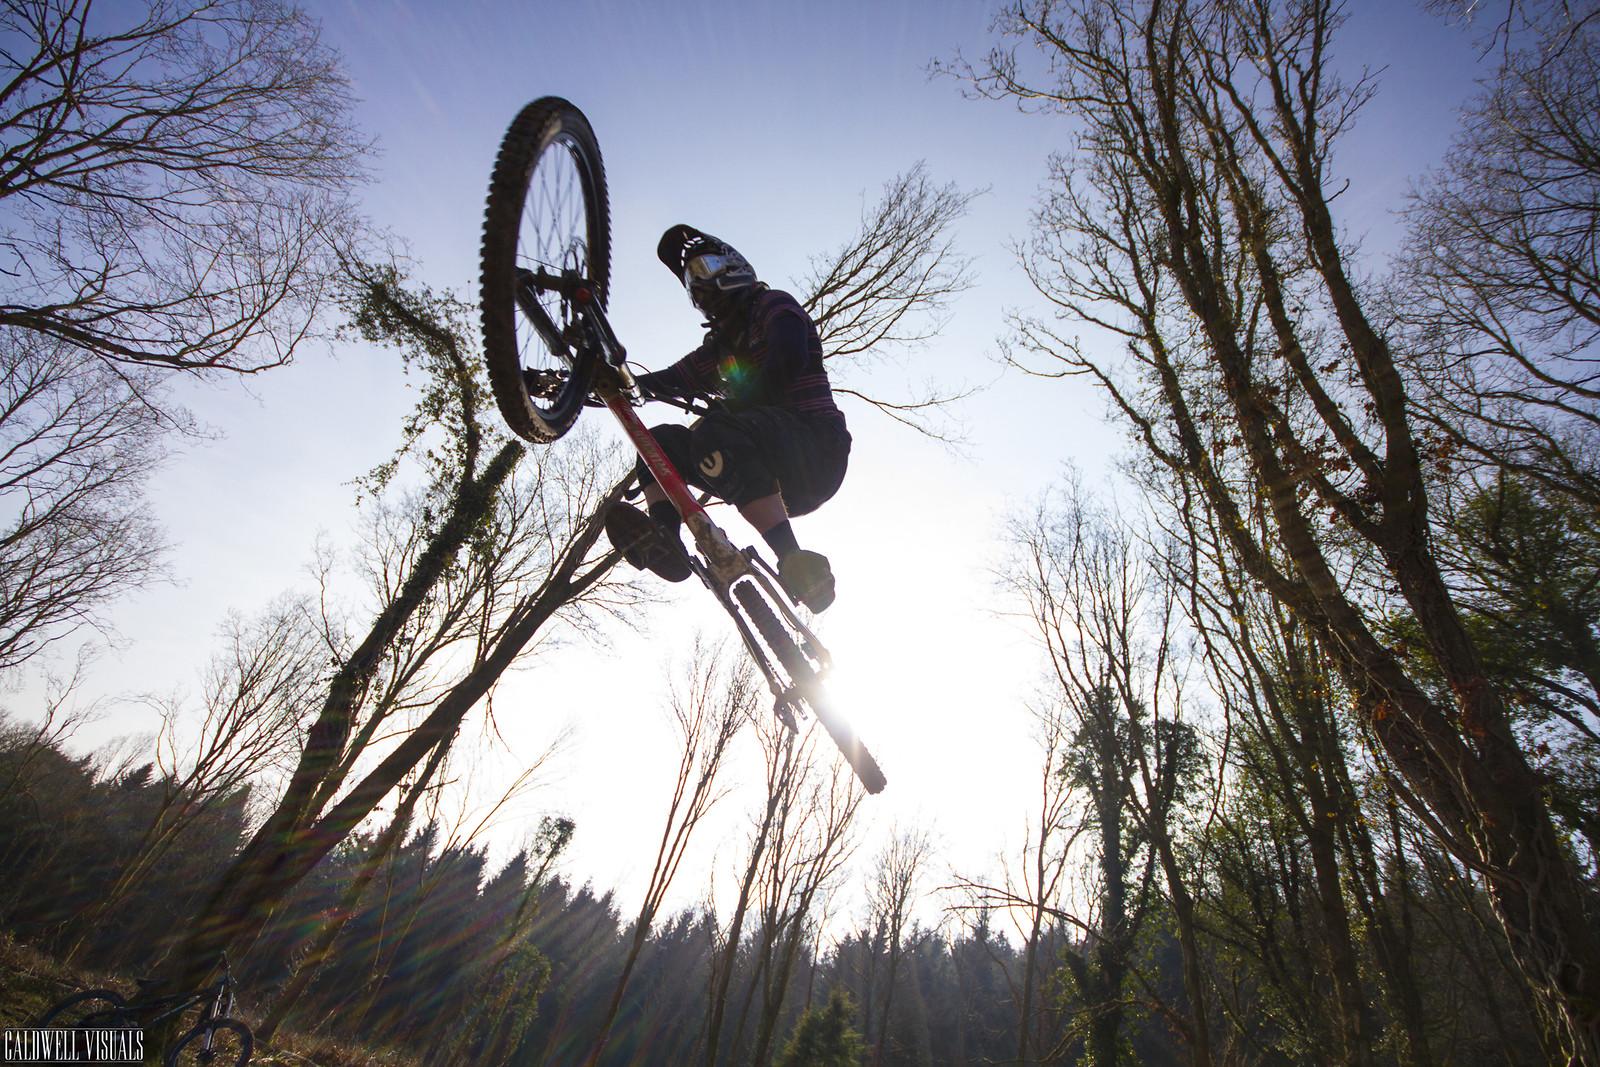 Bradshaw soaring above - CaldwellVisuals - Mountain Biking Pictures - Vital MTB